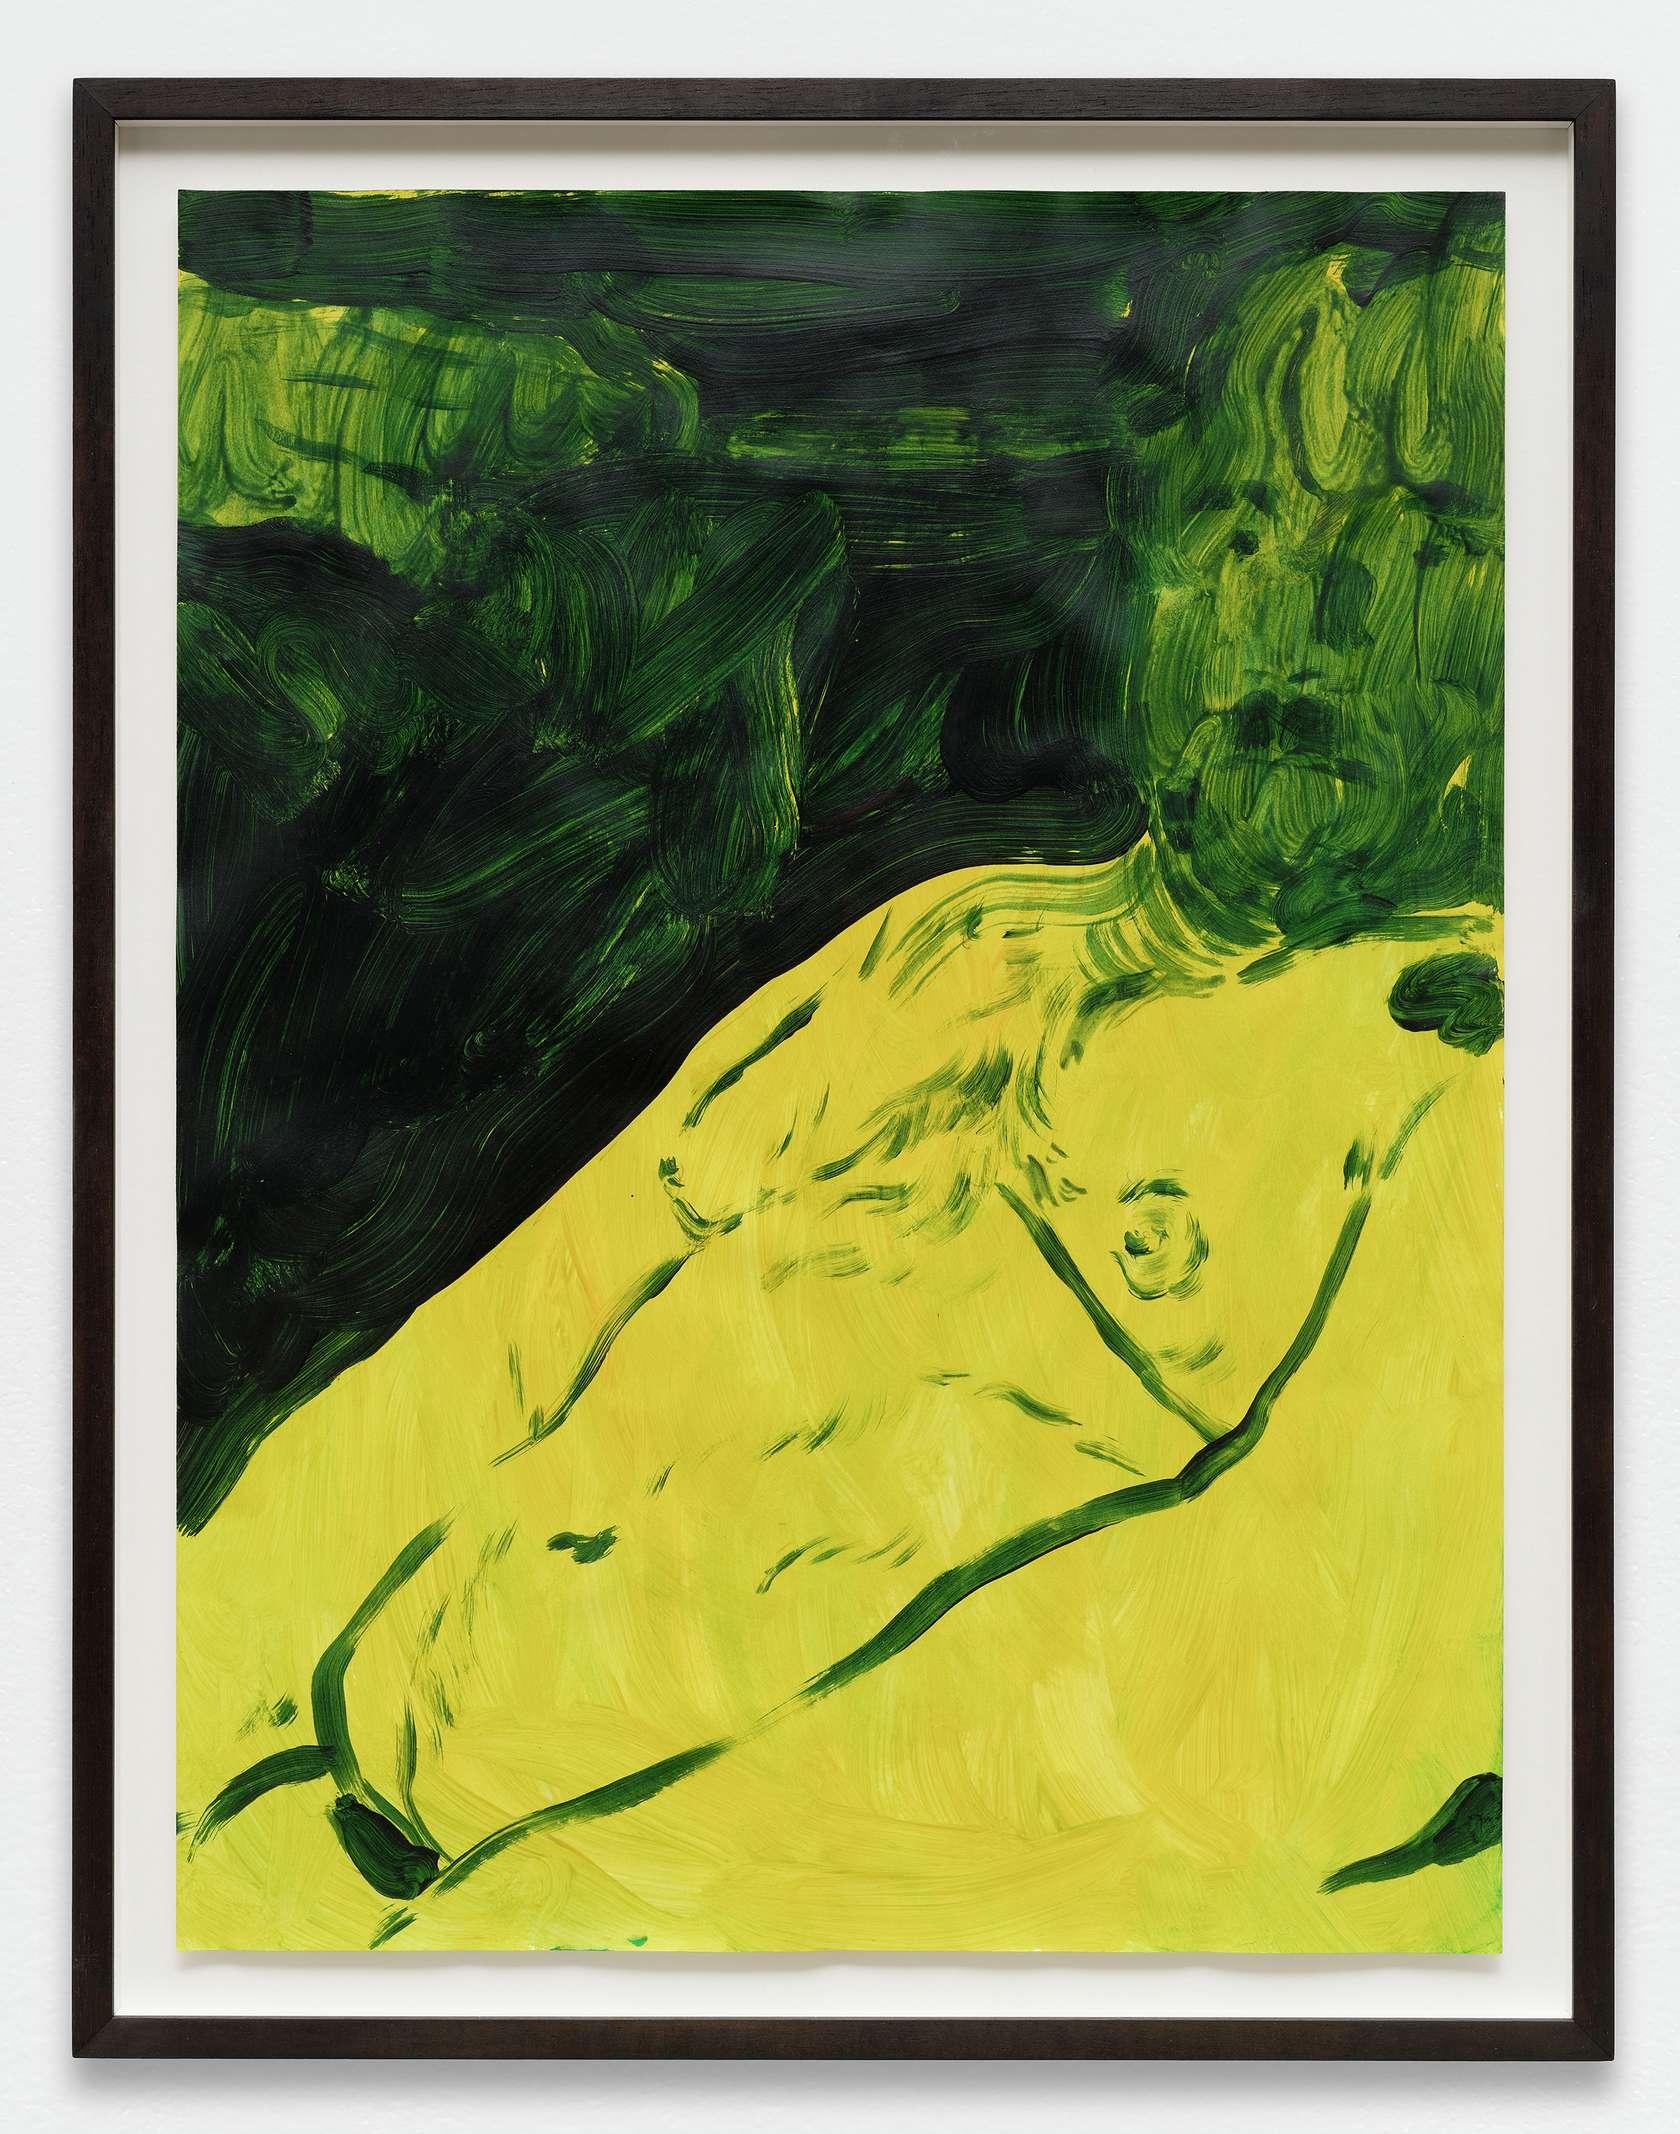 Anthony Cudahy, Green stare, 2019 Acrylique sur papier61 × 46 cm / 24  × 18 1/8 in. | 68 × 53 cm / 26 6/8 × 20 7/8 in. (encadré/framed)